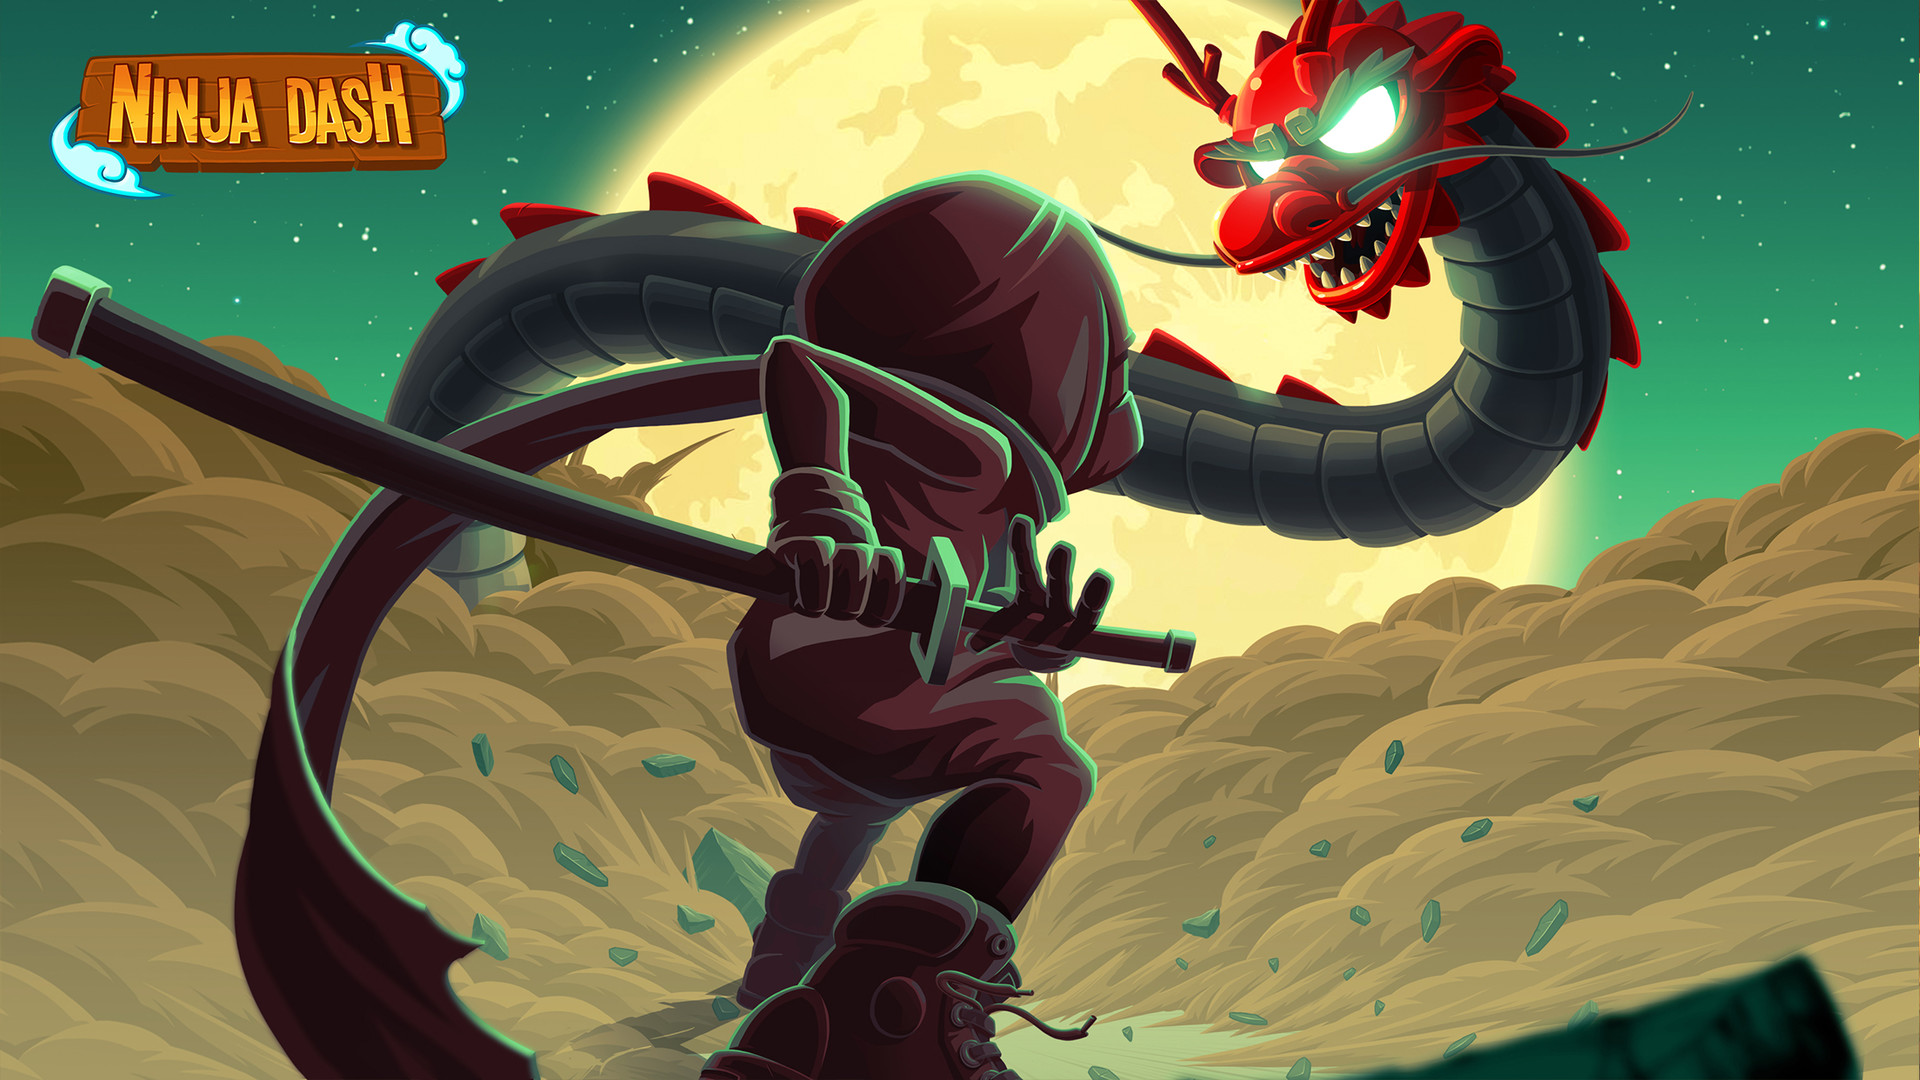 Dragon Master Scriptbloxian Studios Roblox Ninja Legends Wiki Ninja Group Game